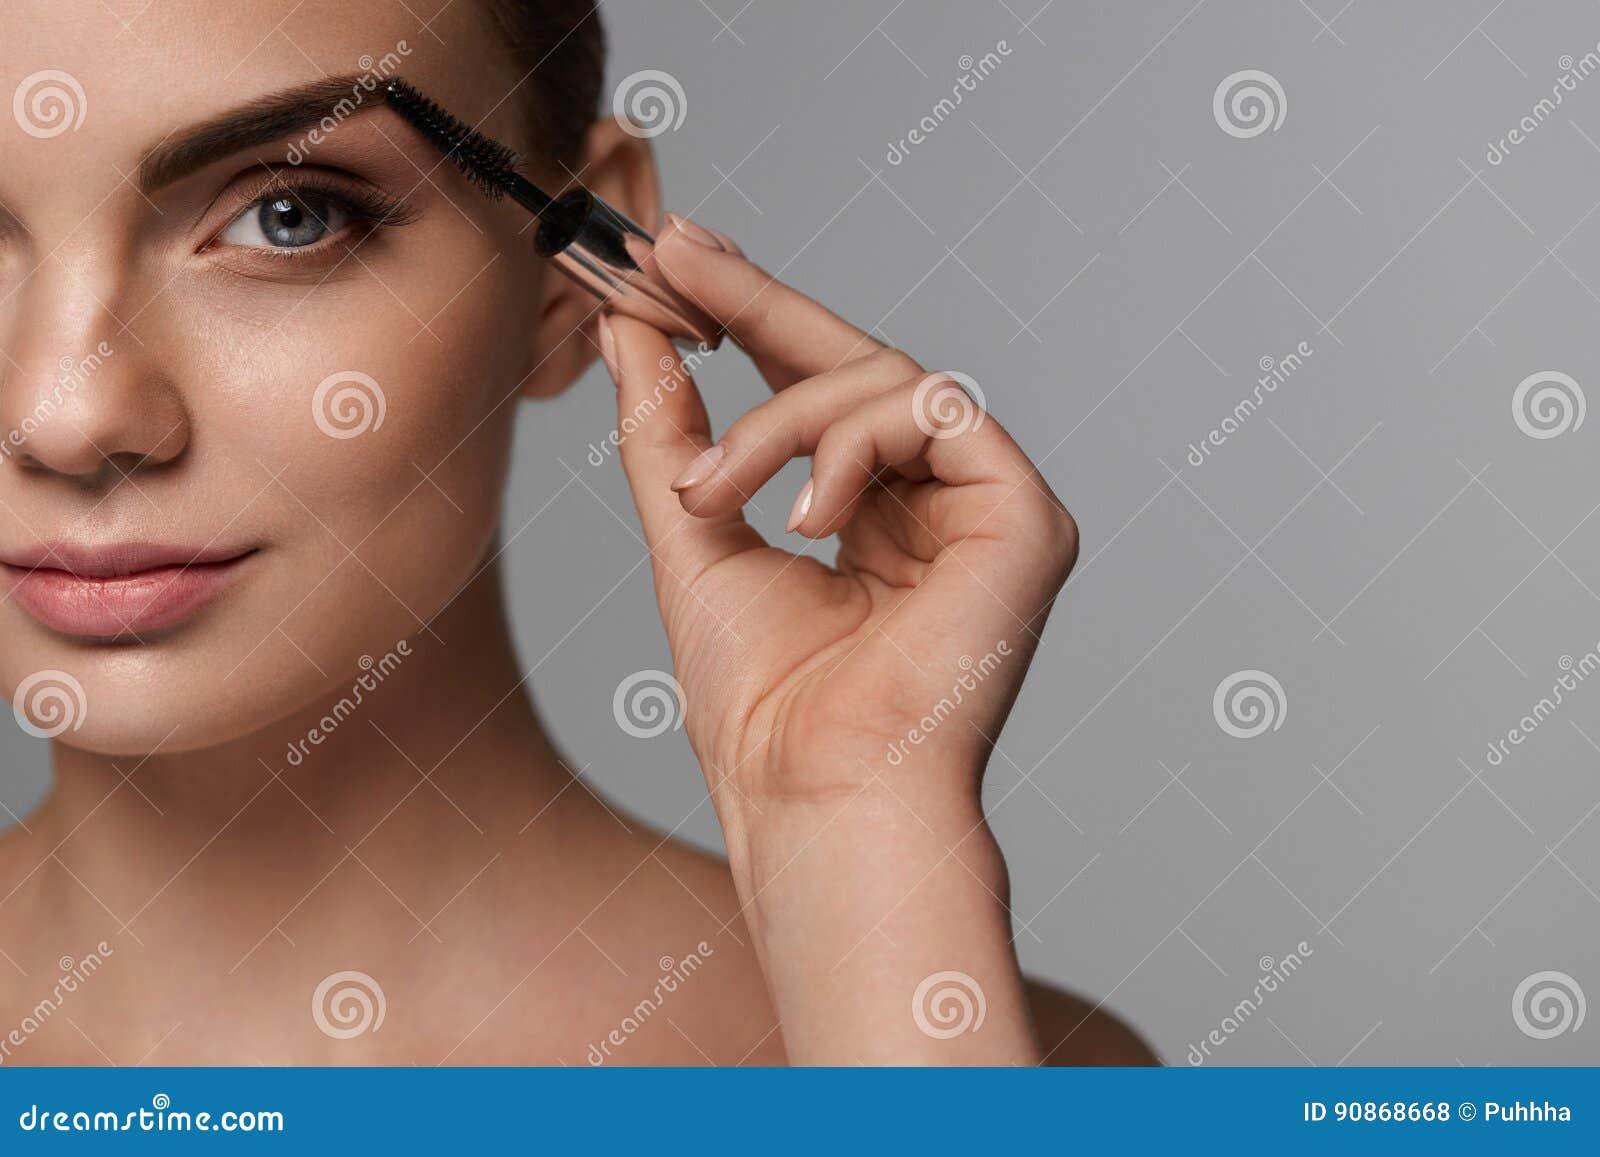 image Cepillo de maquillaje de la esposa